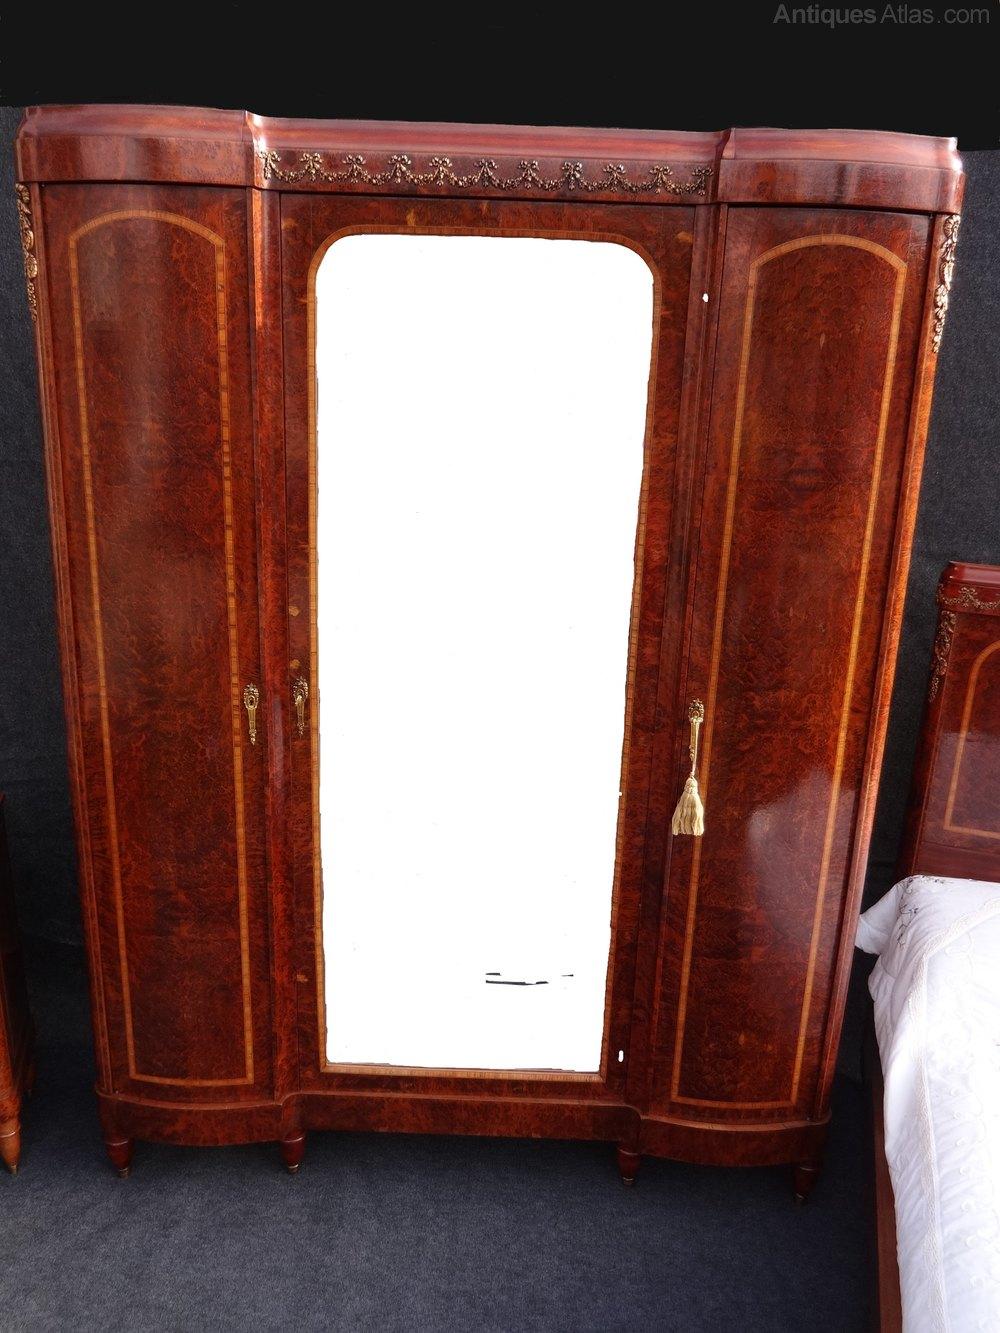 superb quality amboyna bedroom suite antiques atlas